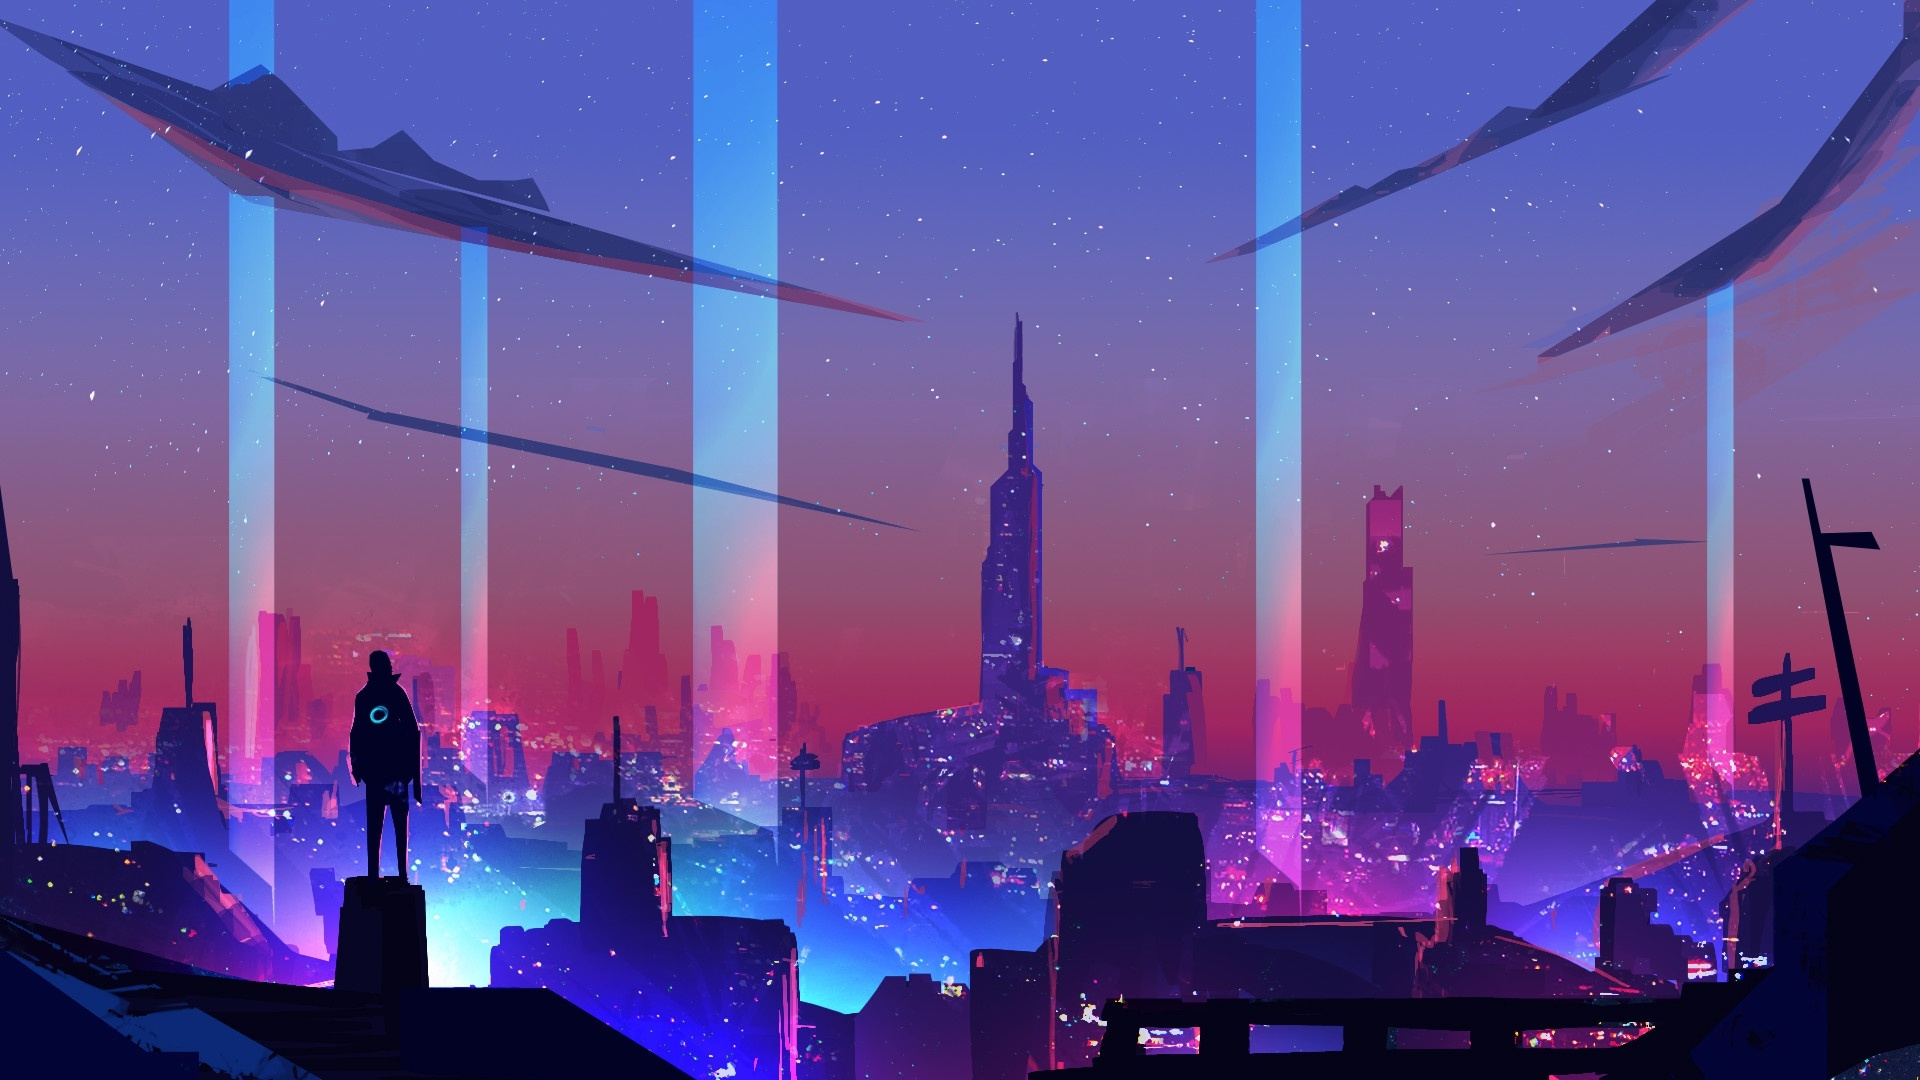 Neon Wave Futuristic City Wallpaper, HD Artist 4K ...